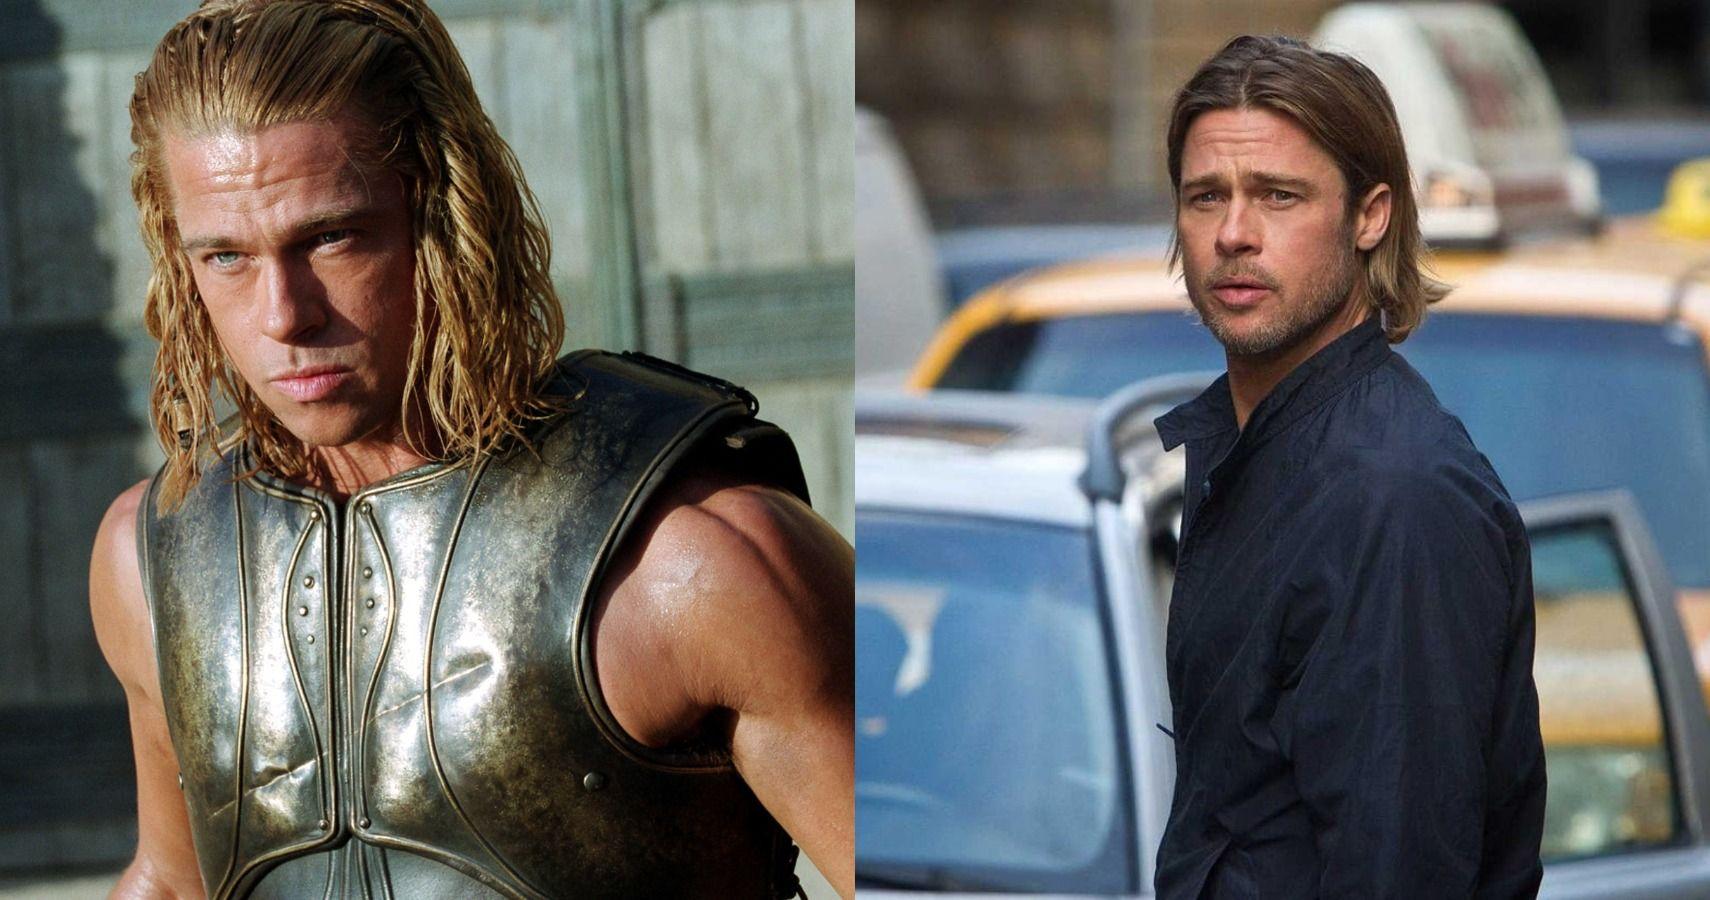 Brad Pitt Movies List: Best to Worst